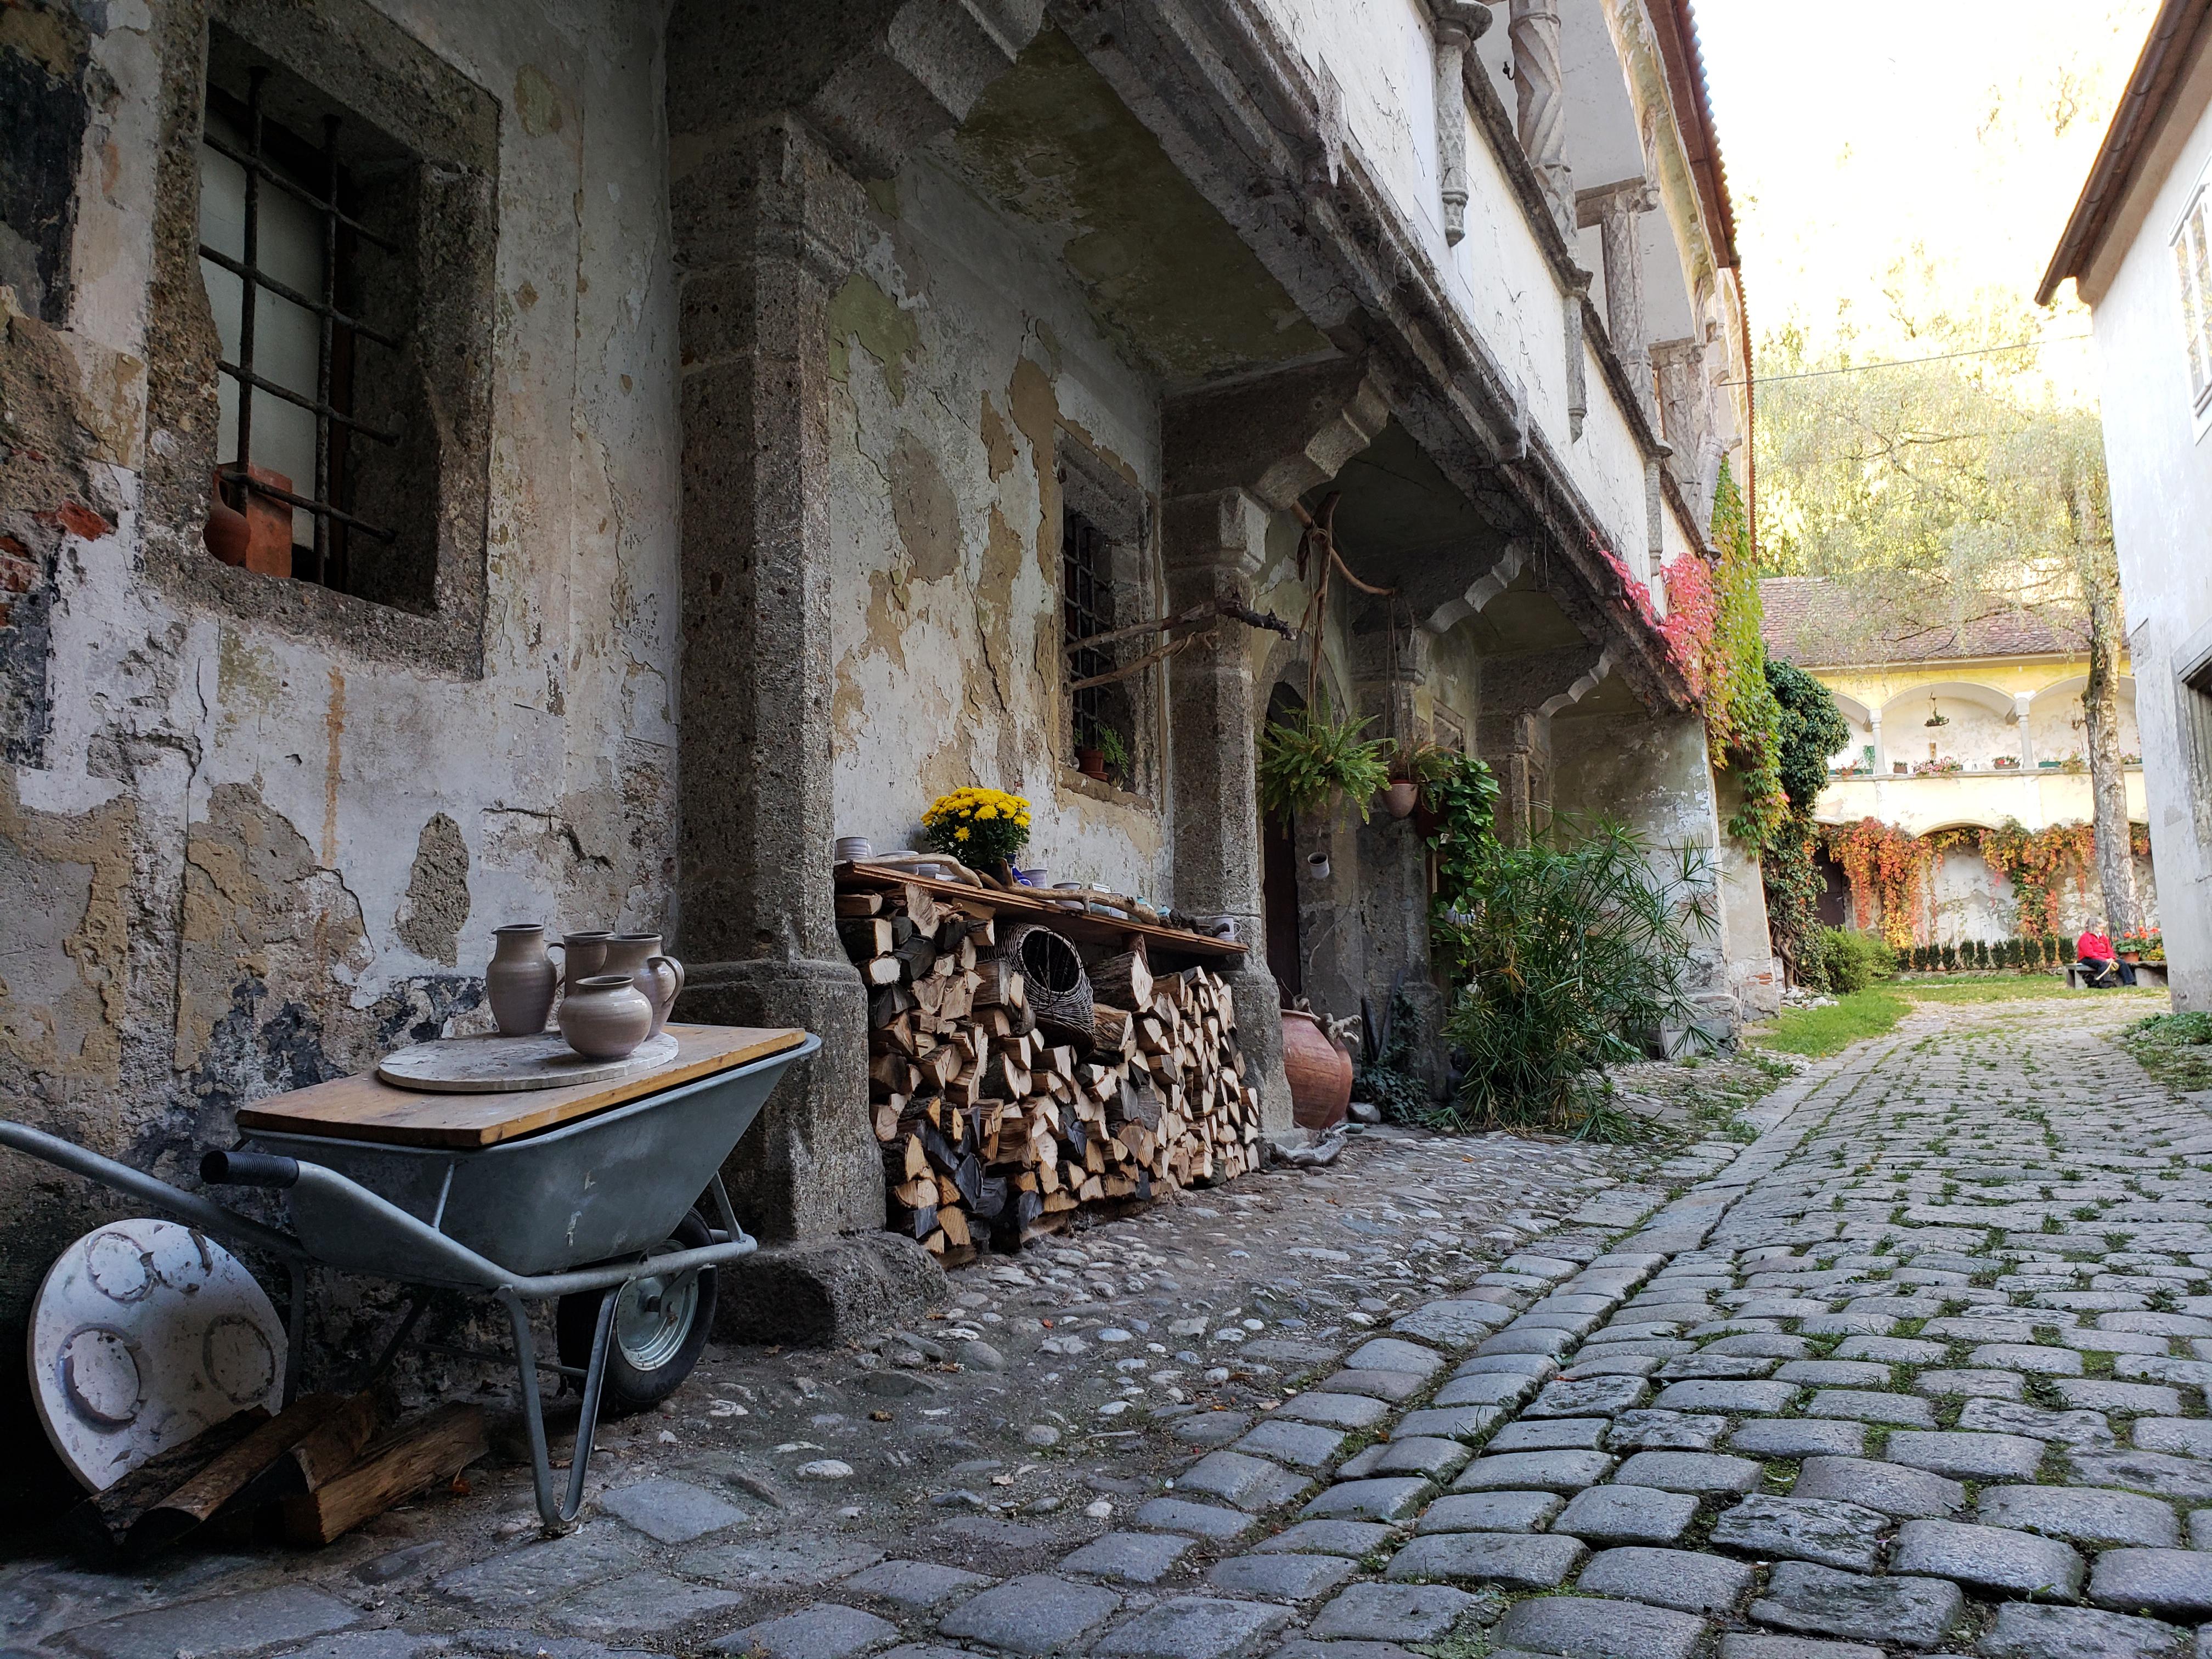 A_City_Guide_to_Steyr_Austria